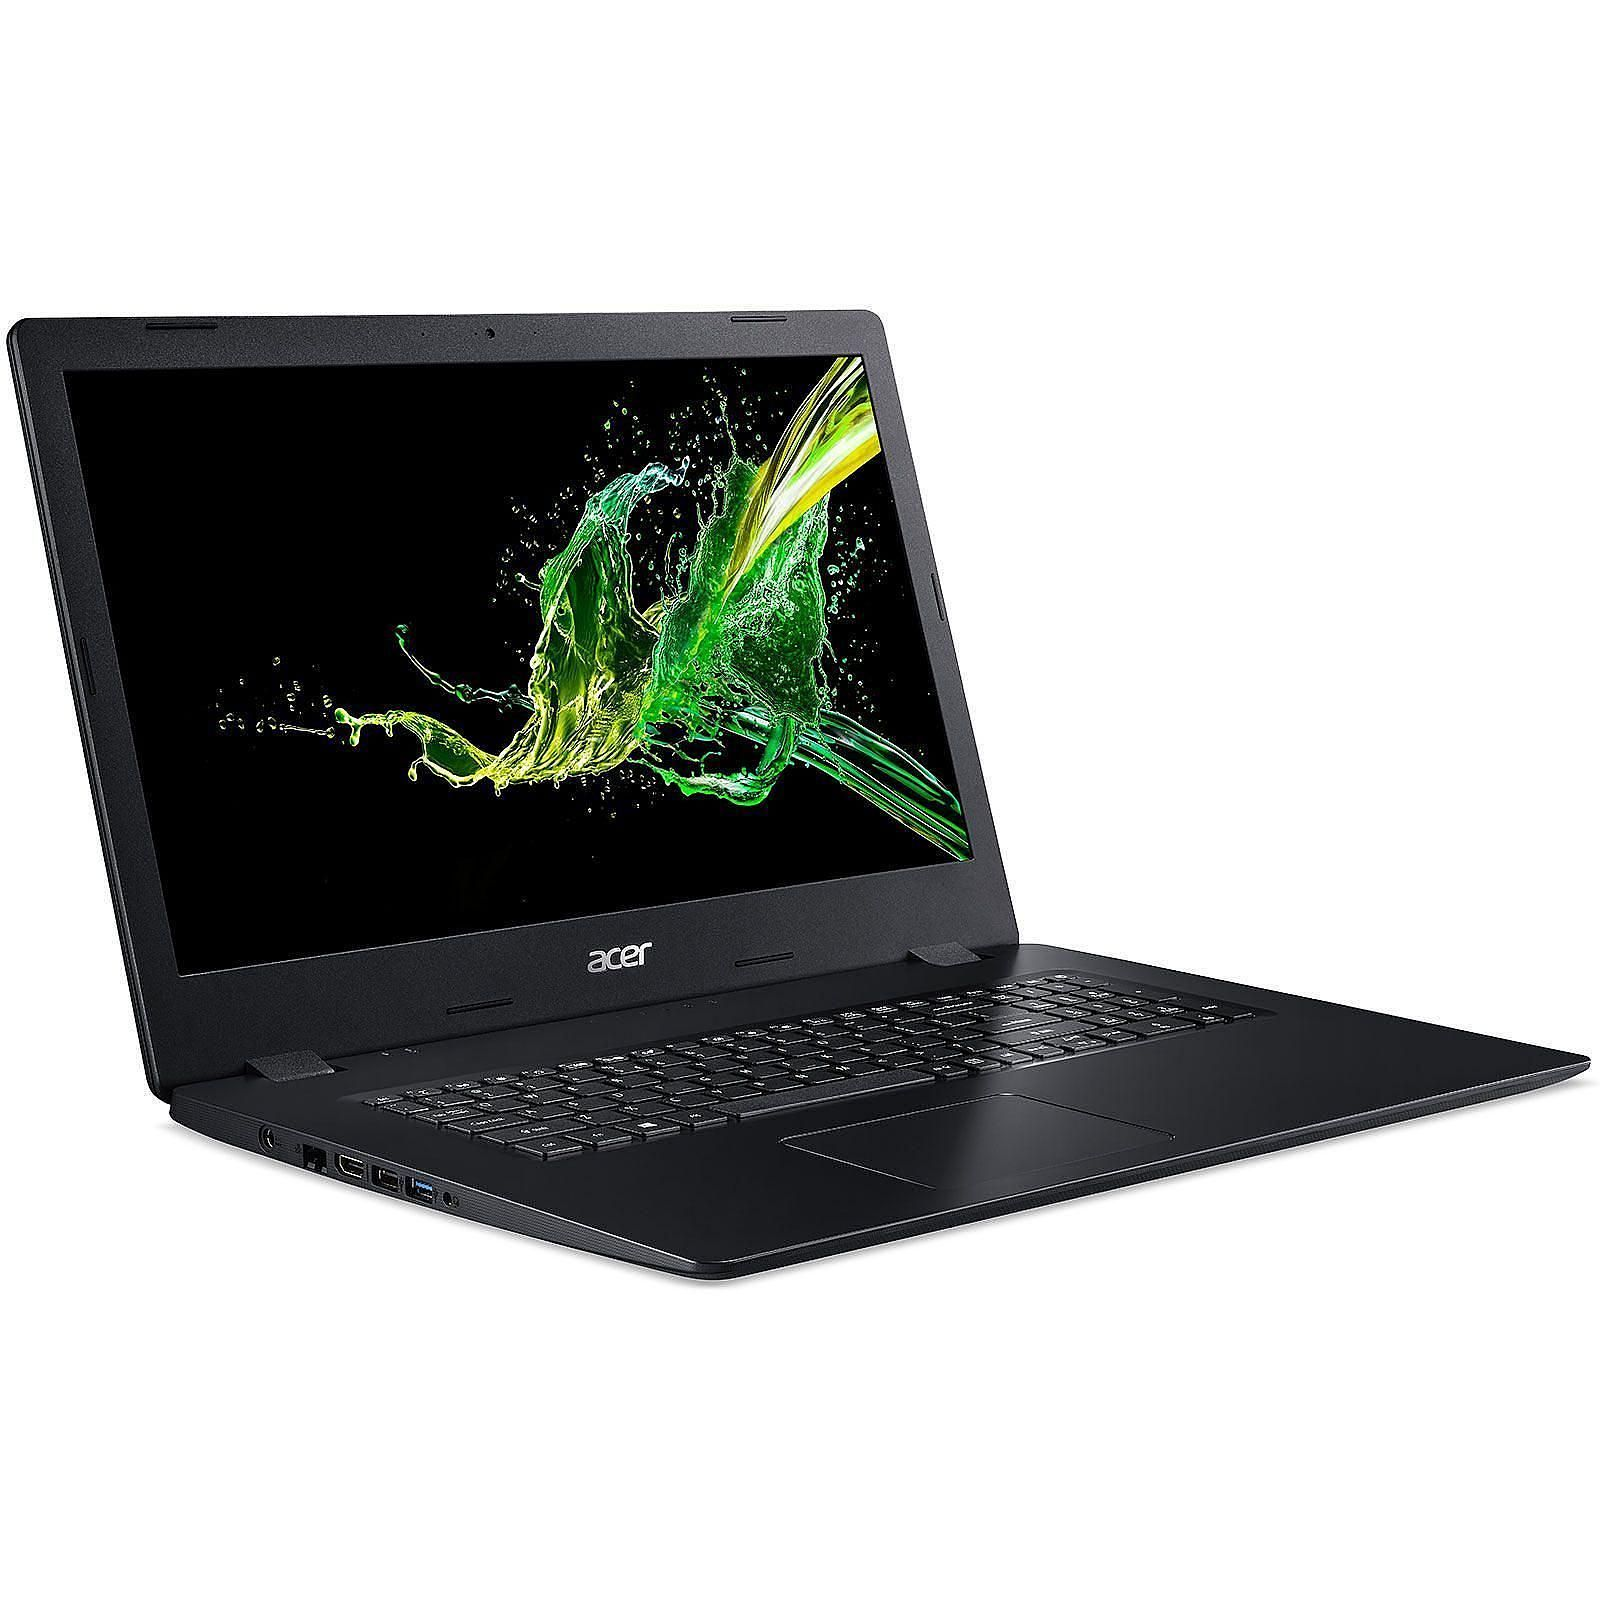 Acer NX.HZWEF.008 - PC portable Acer - Cybertek.fr - 0